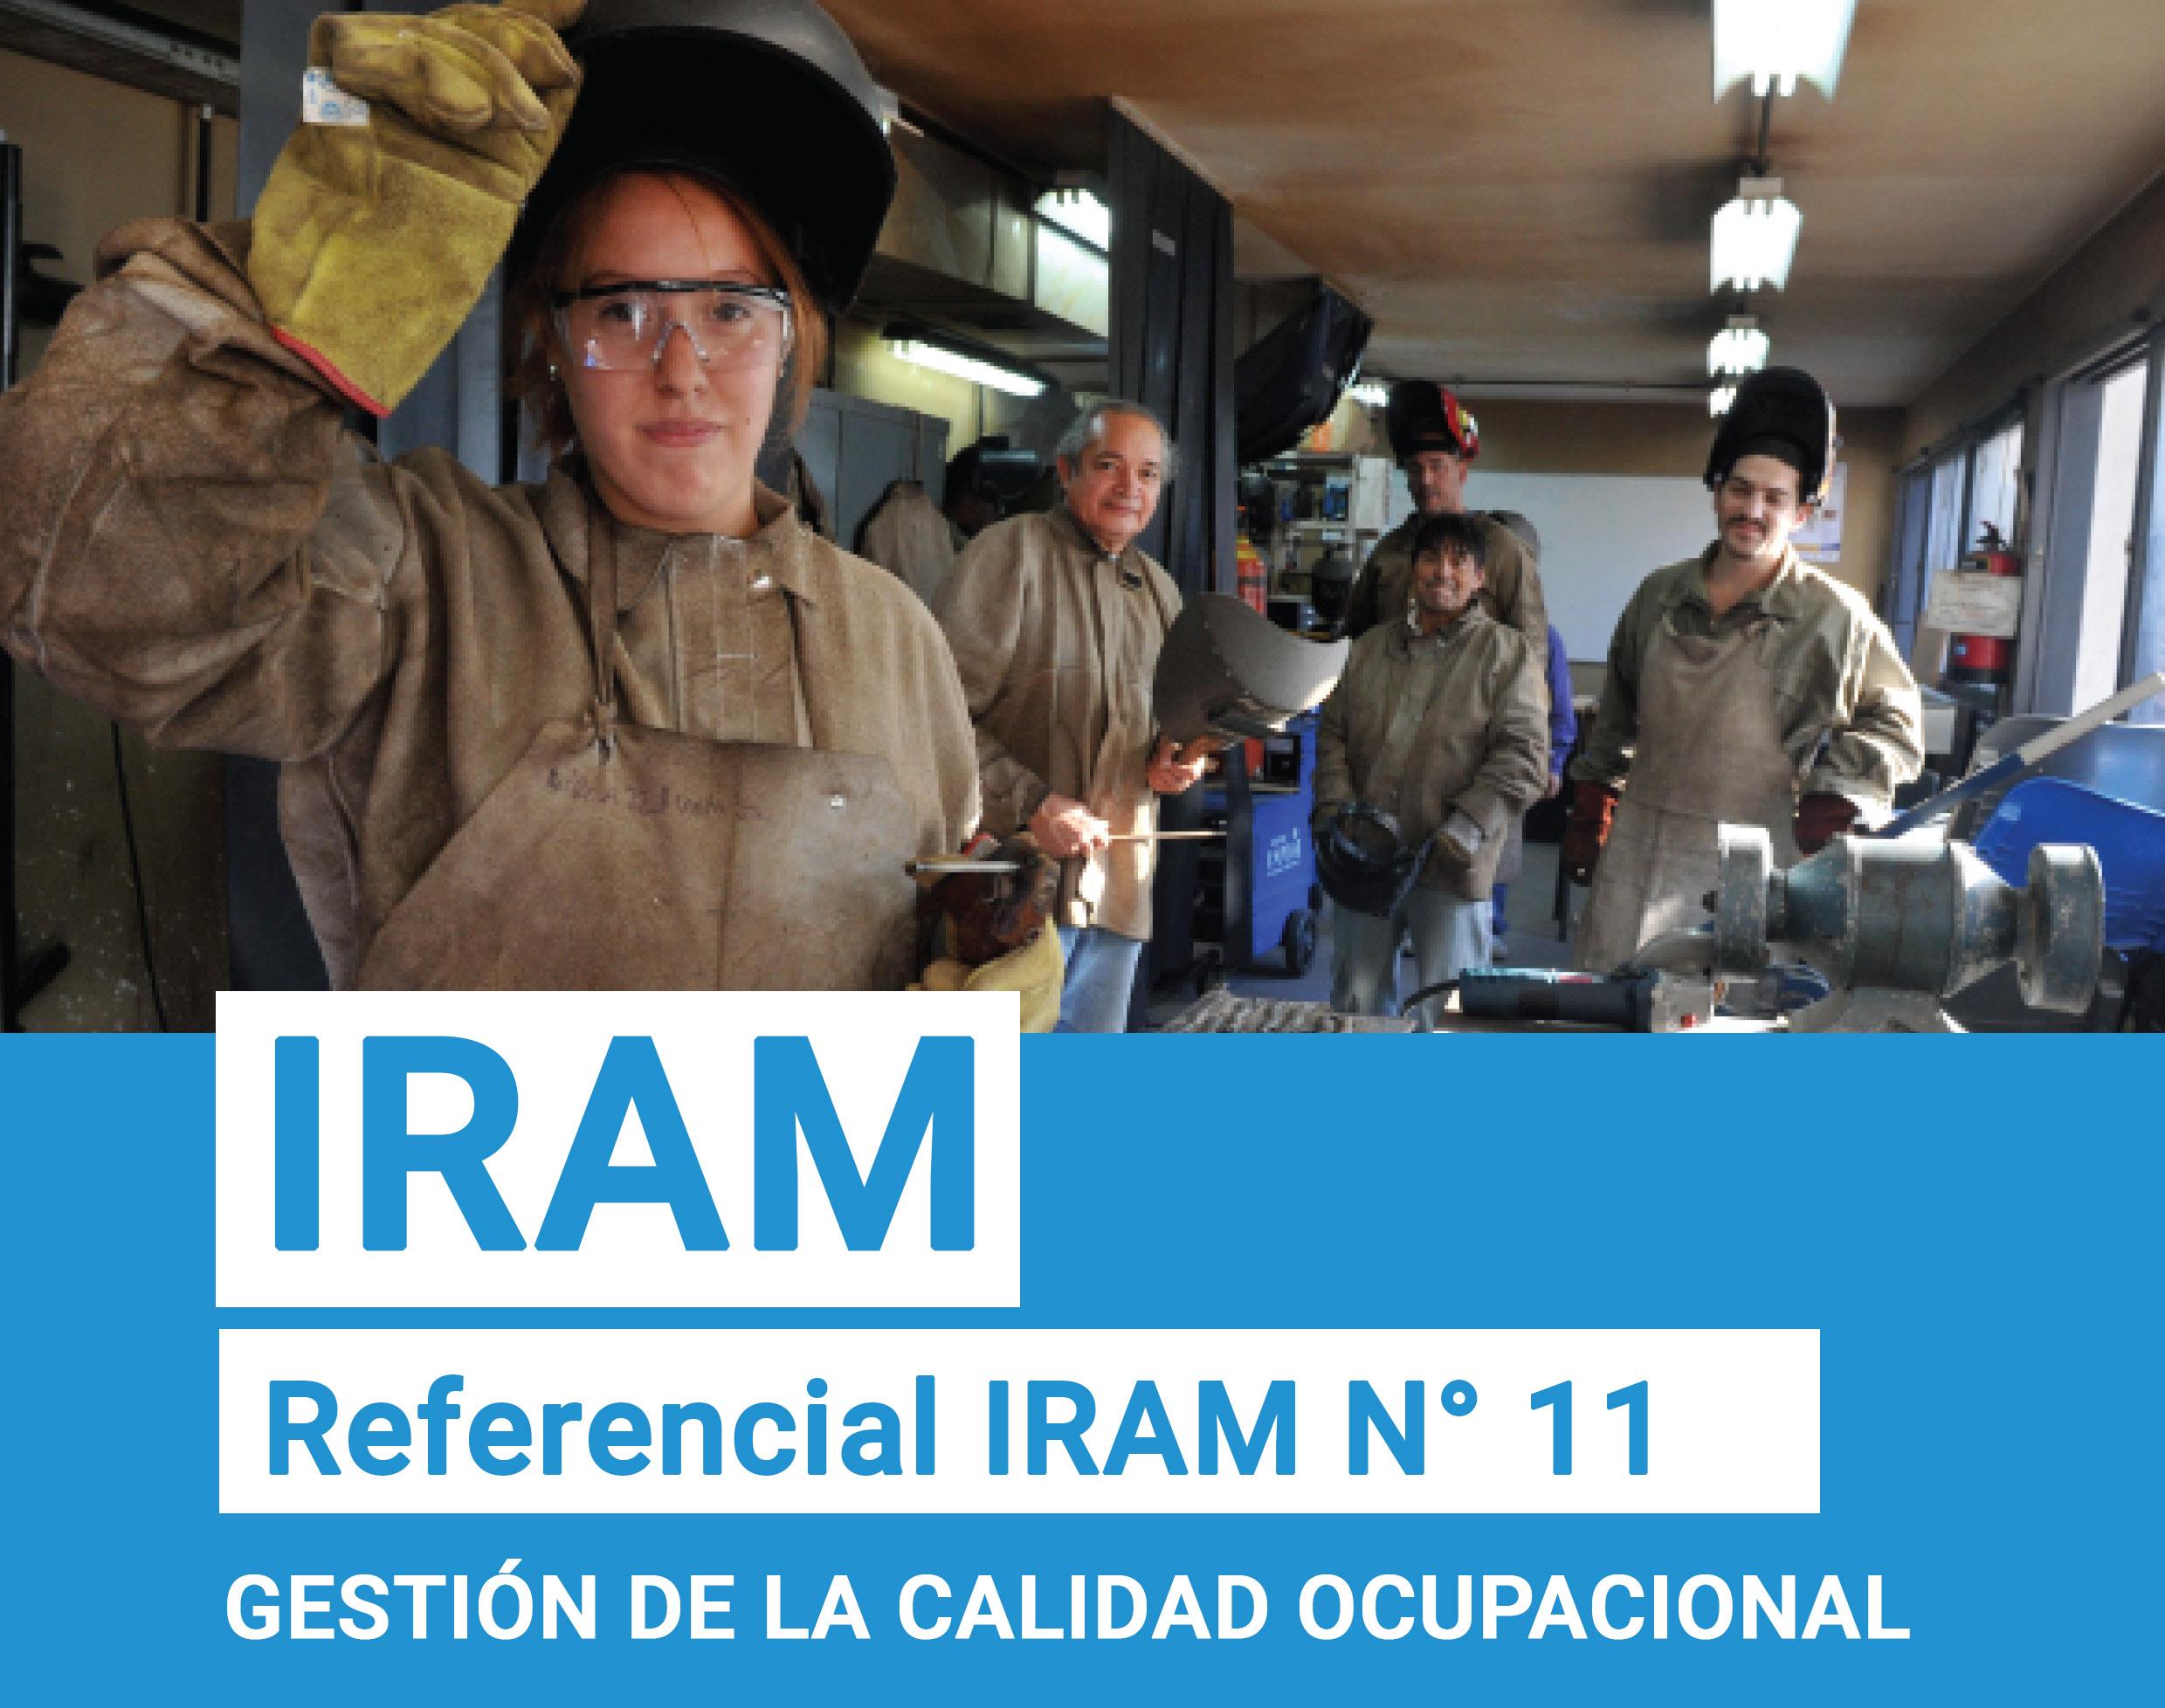 IRAM Referencial 11